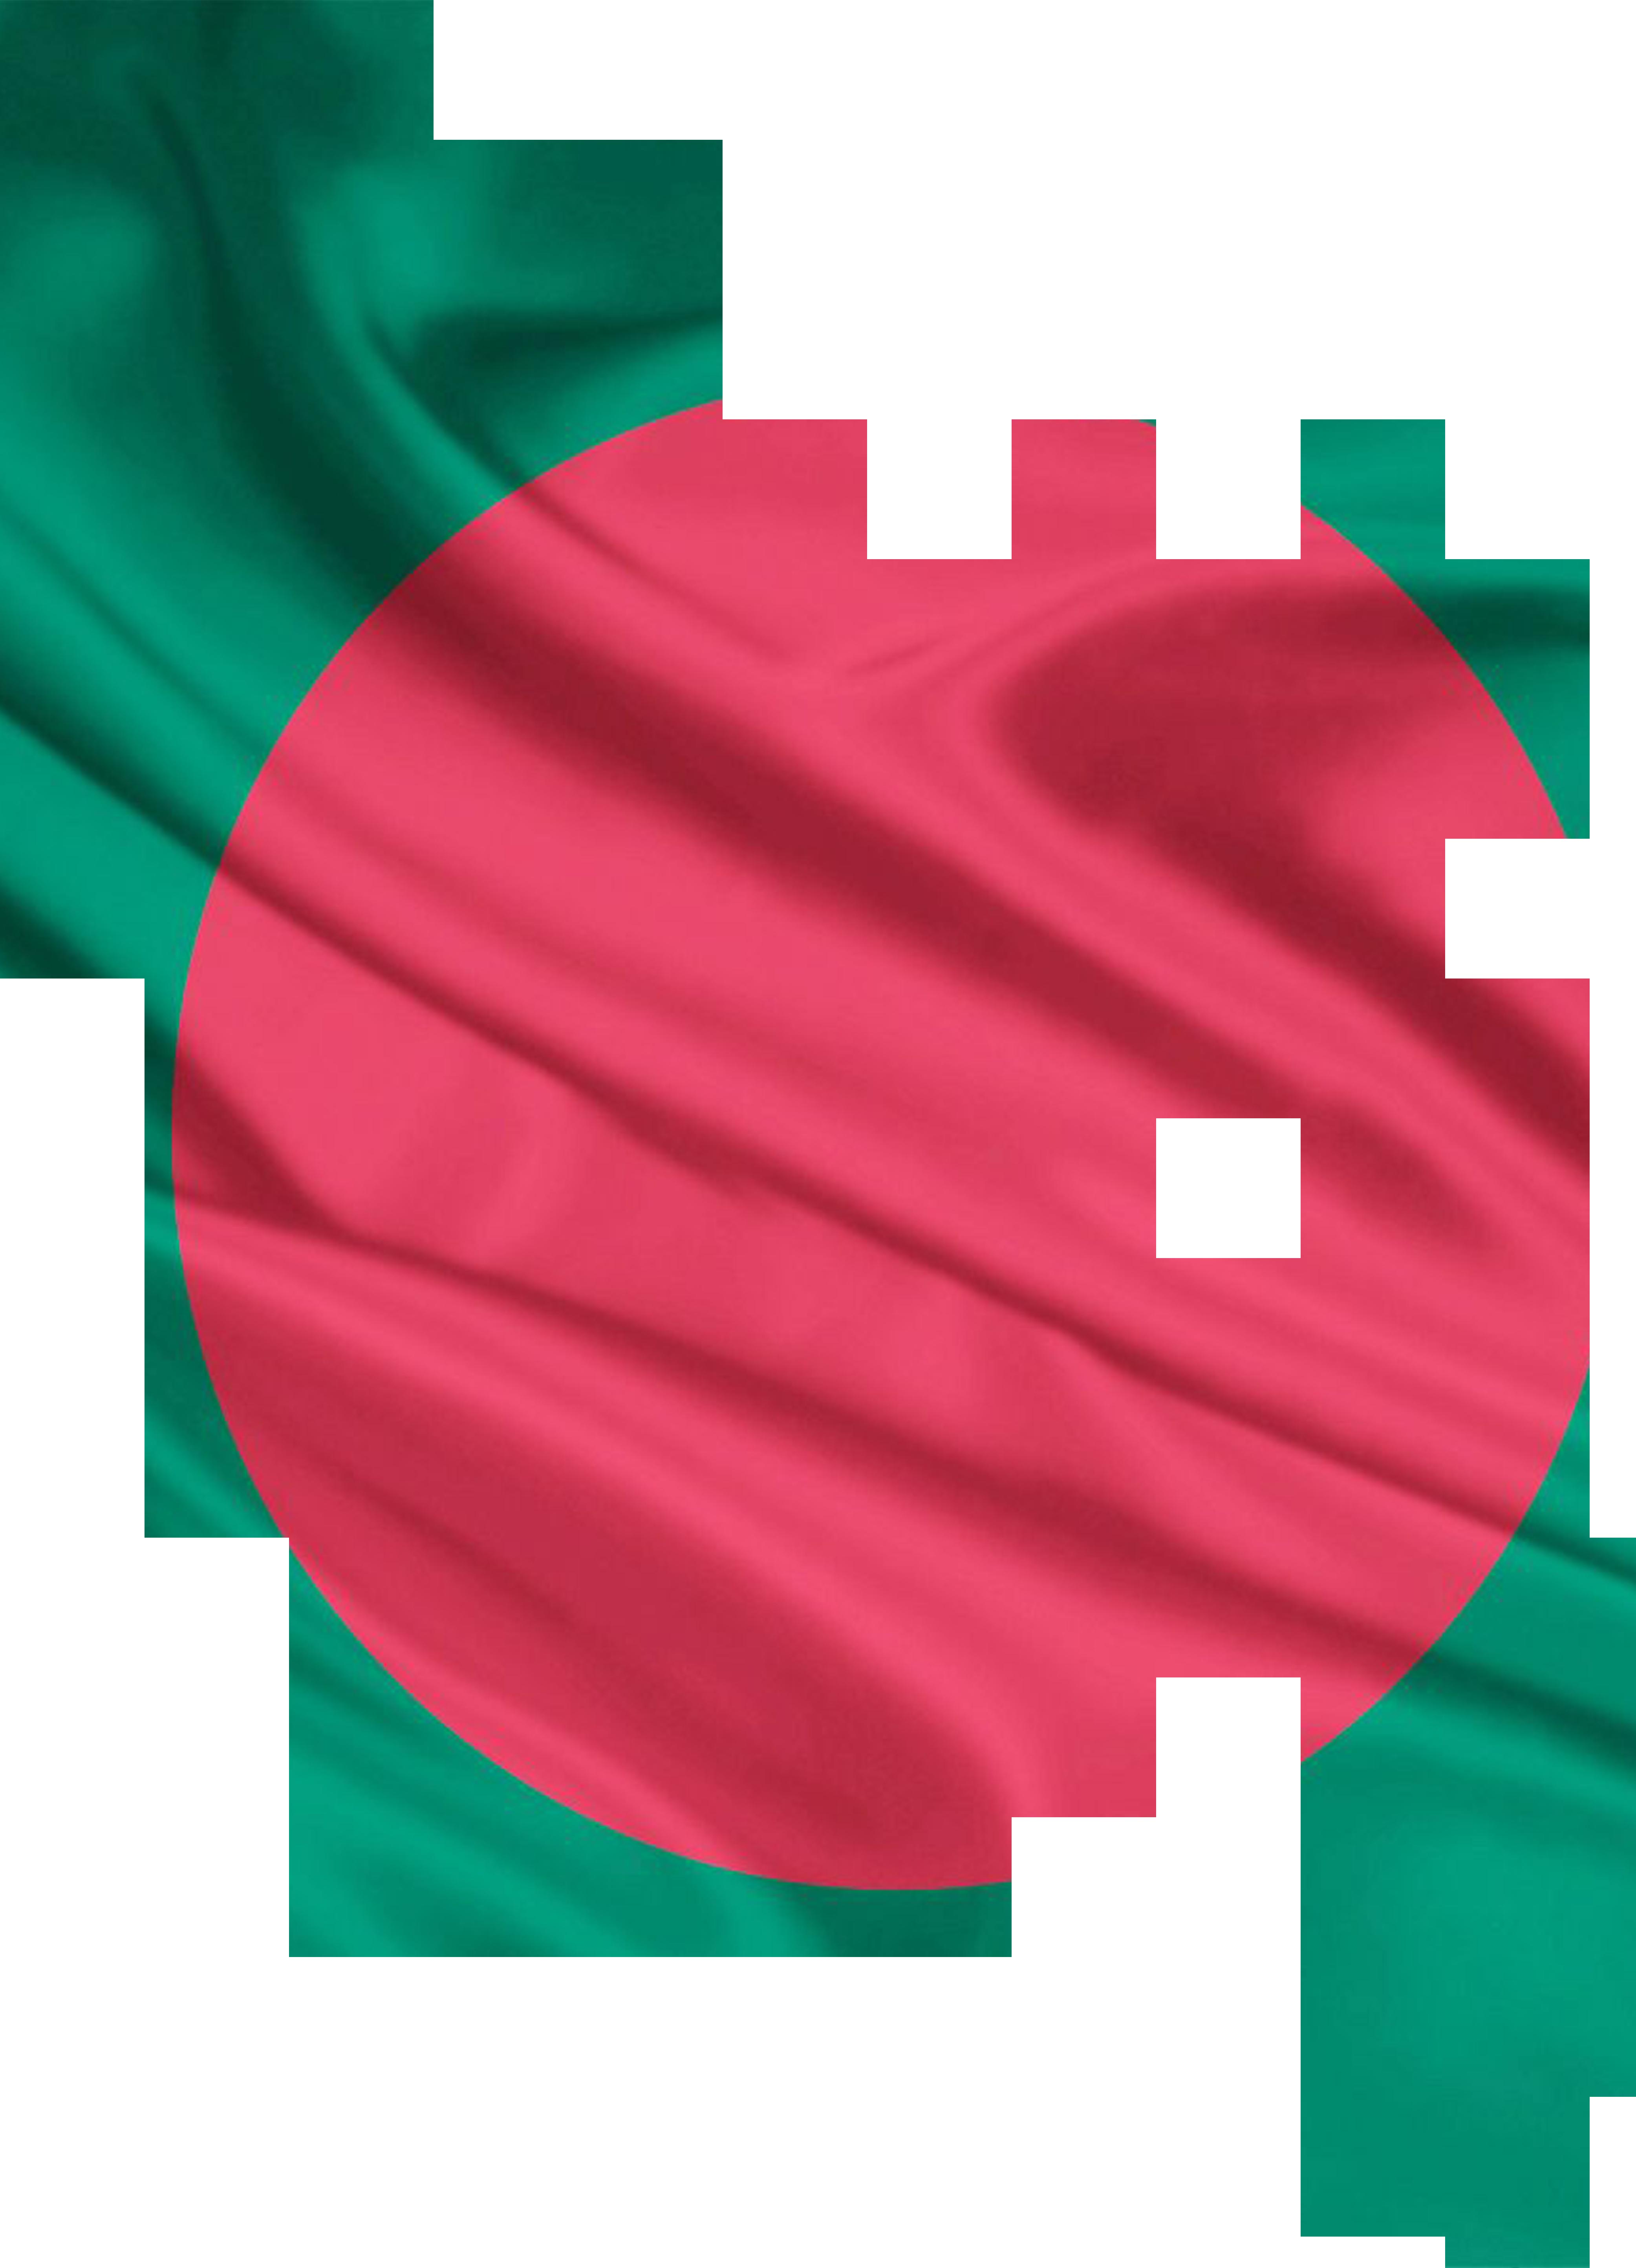 Bangladesh flag & map PNG Image.